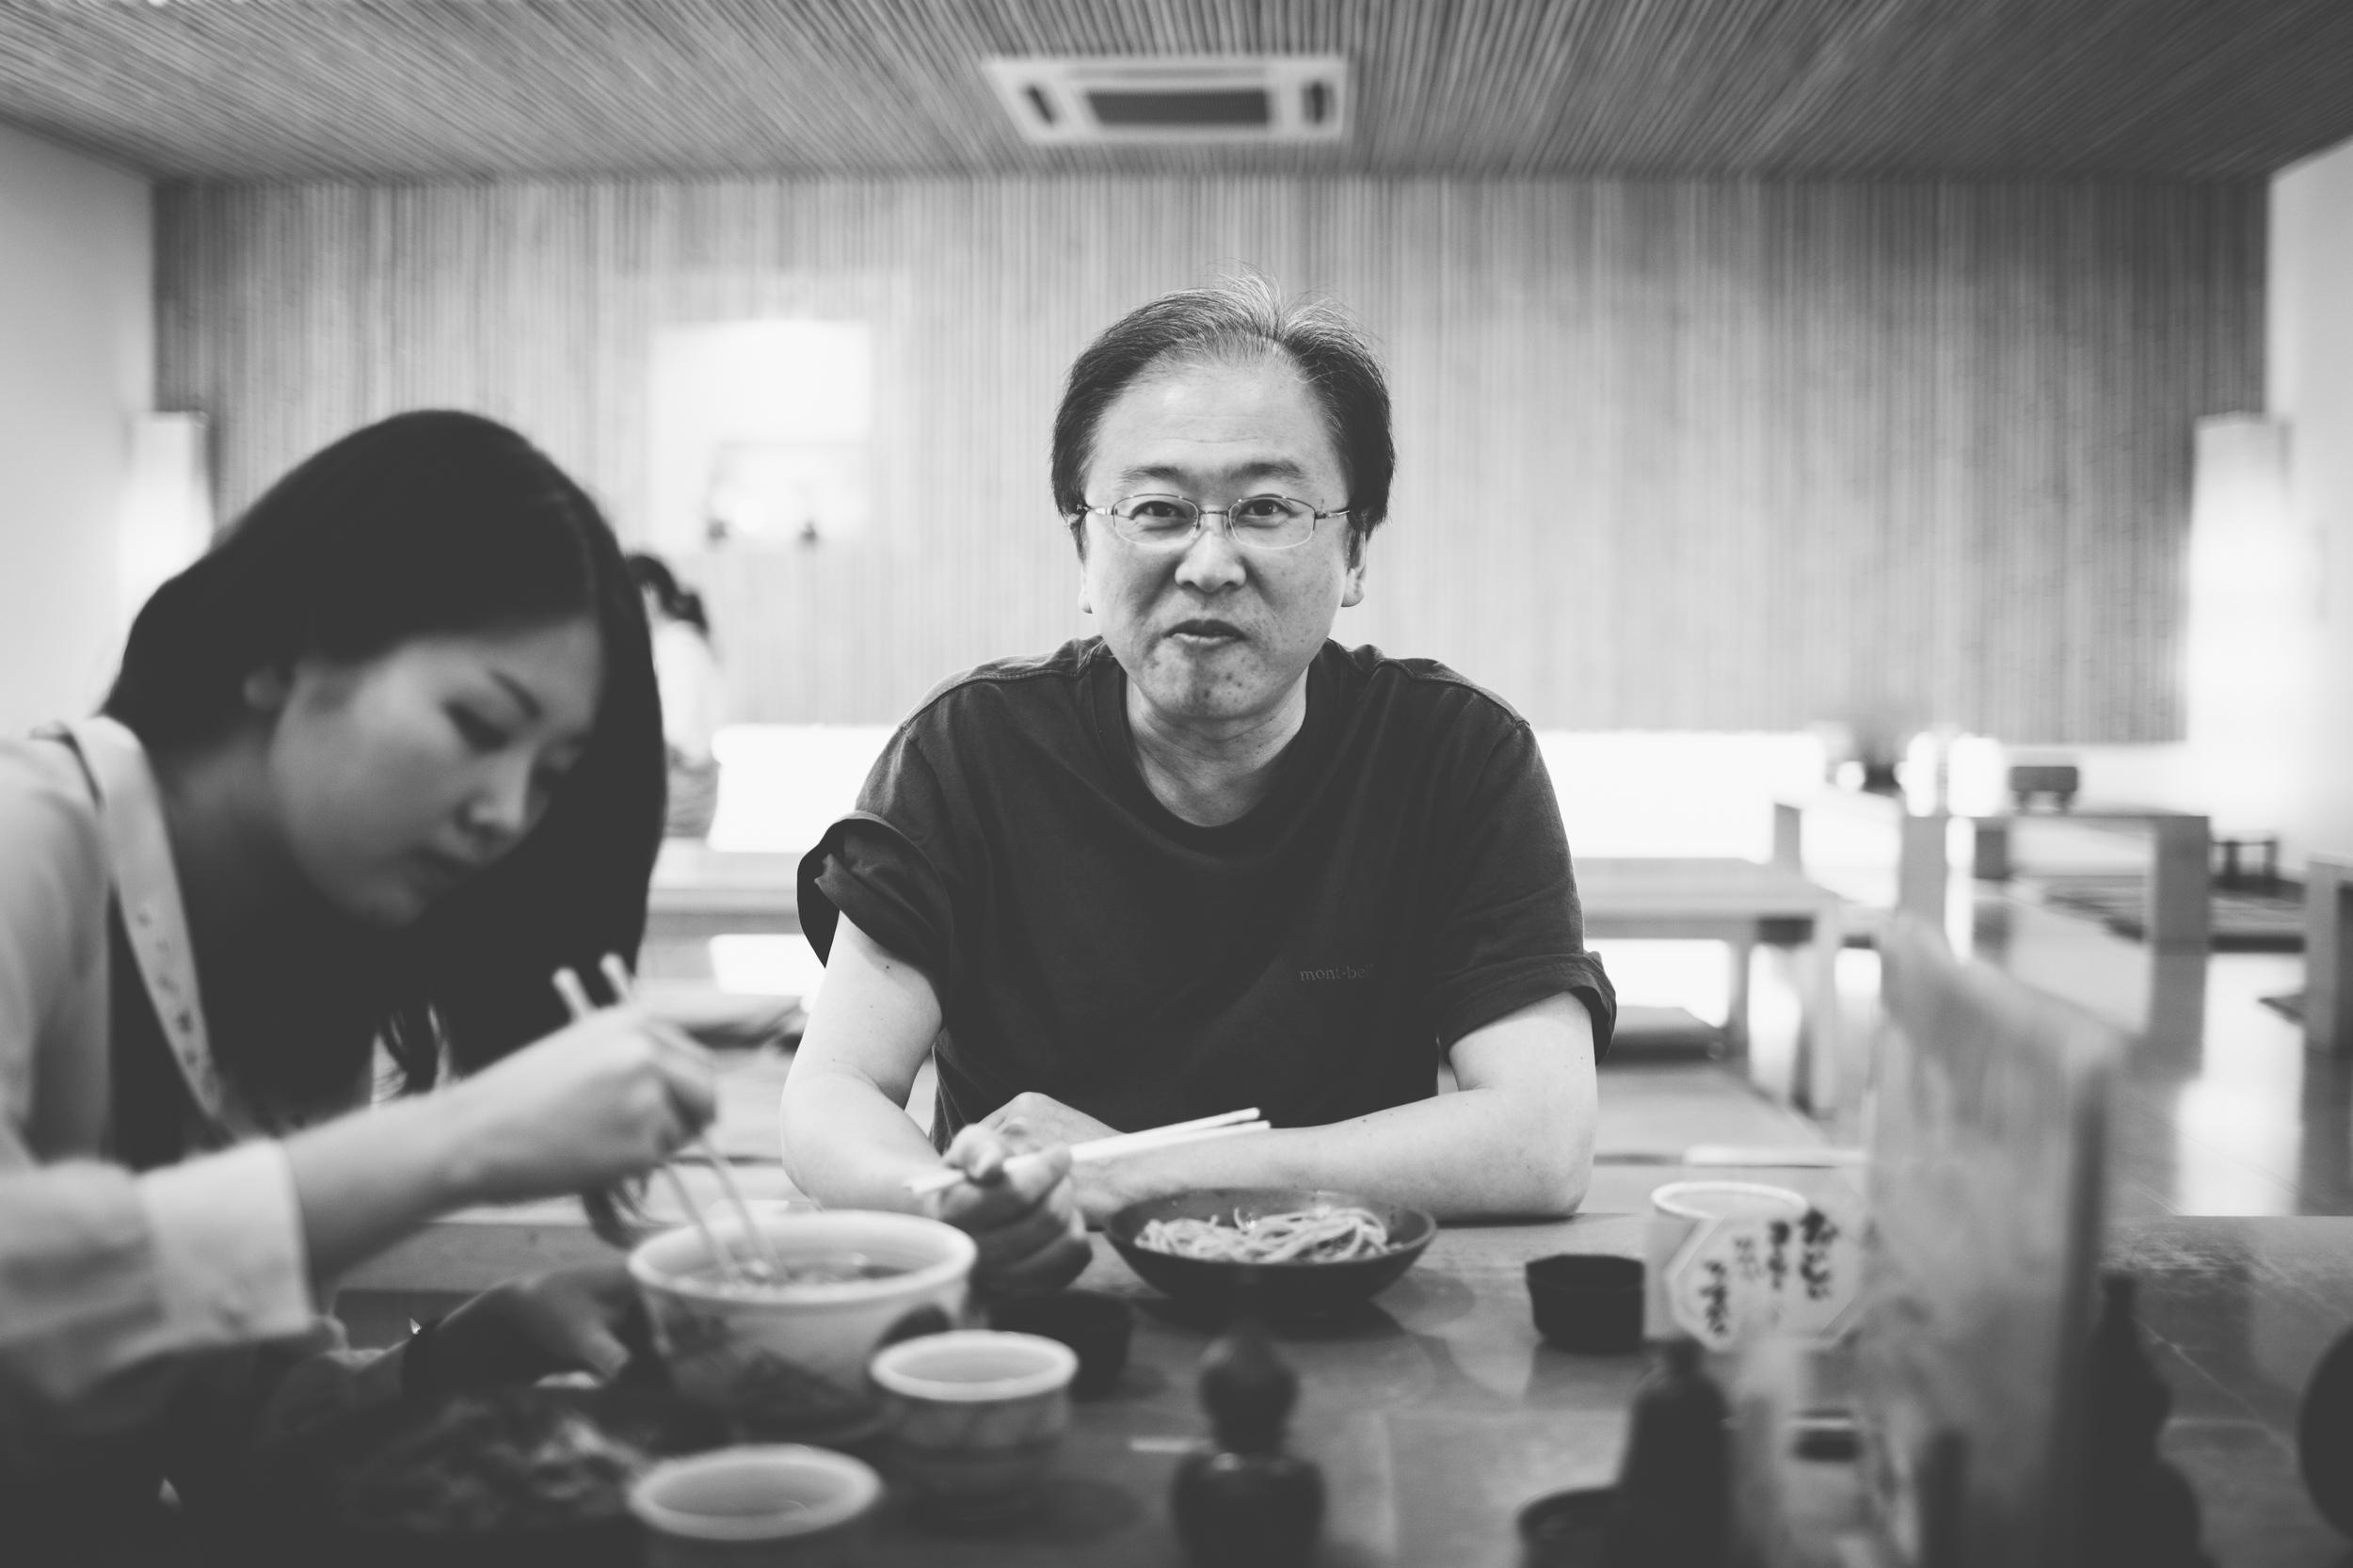 Masaaki eating oroshi soba.